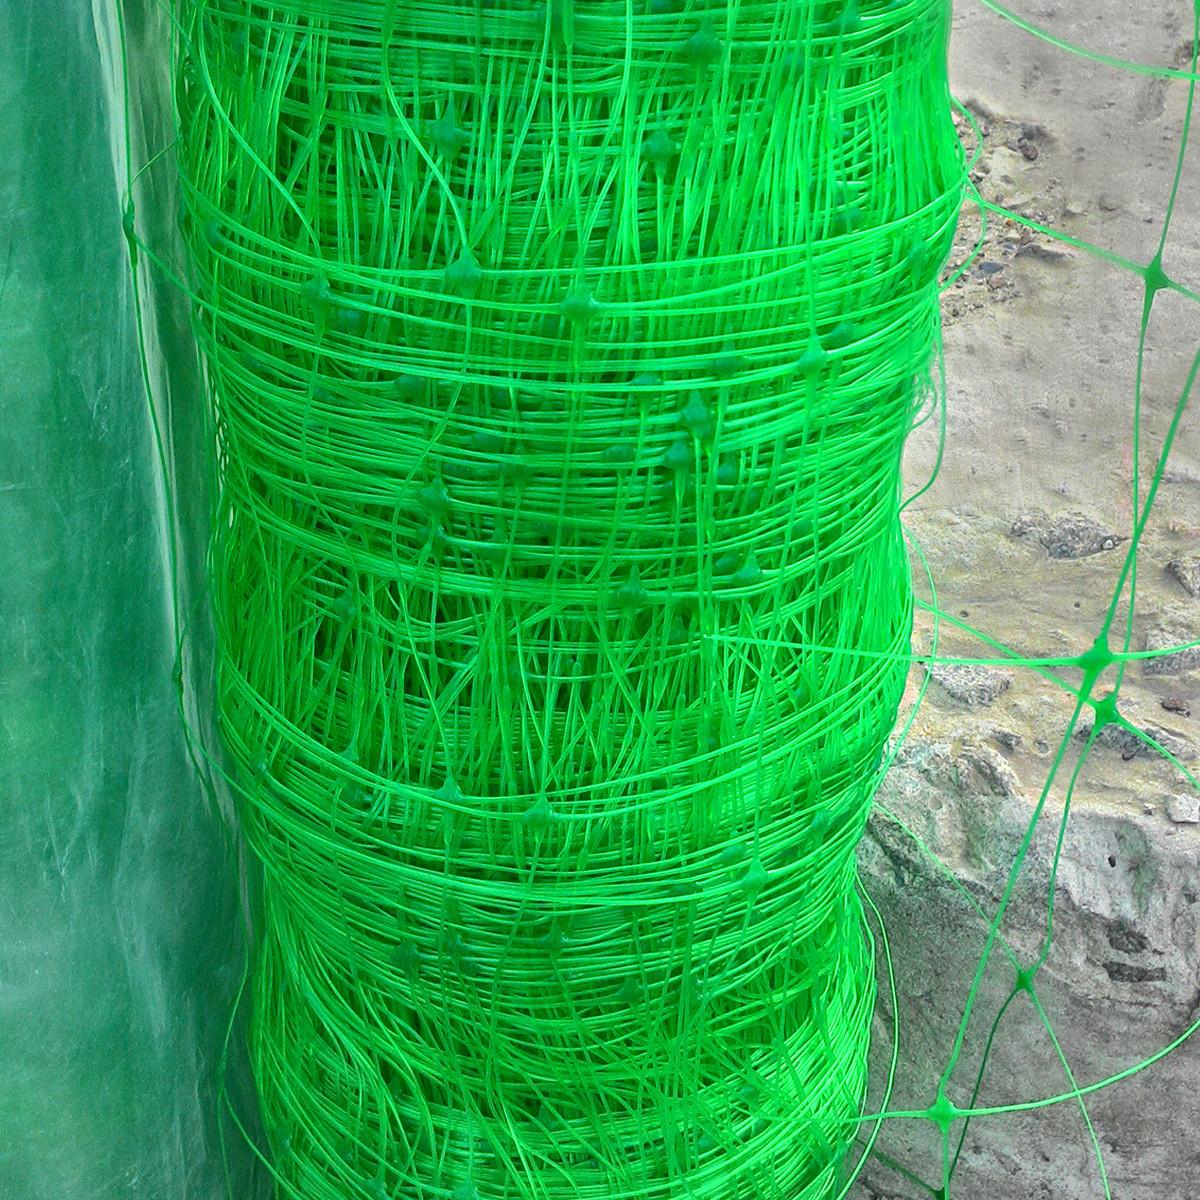 Шпалерная сетка для огурцов 1,7 м х 20 м ячейка 15х17 мм (Украина)